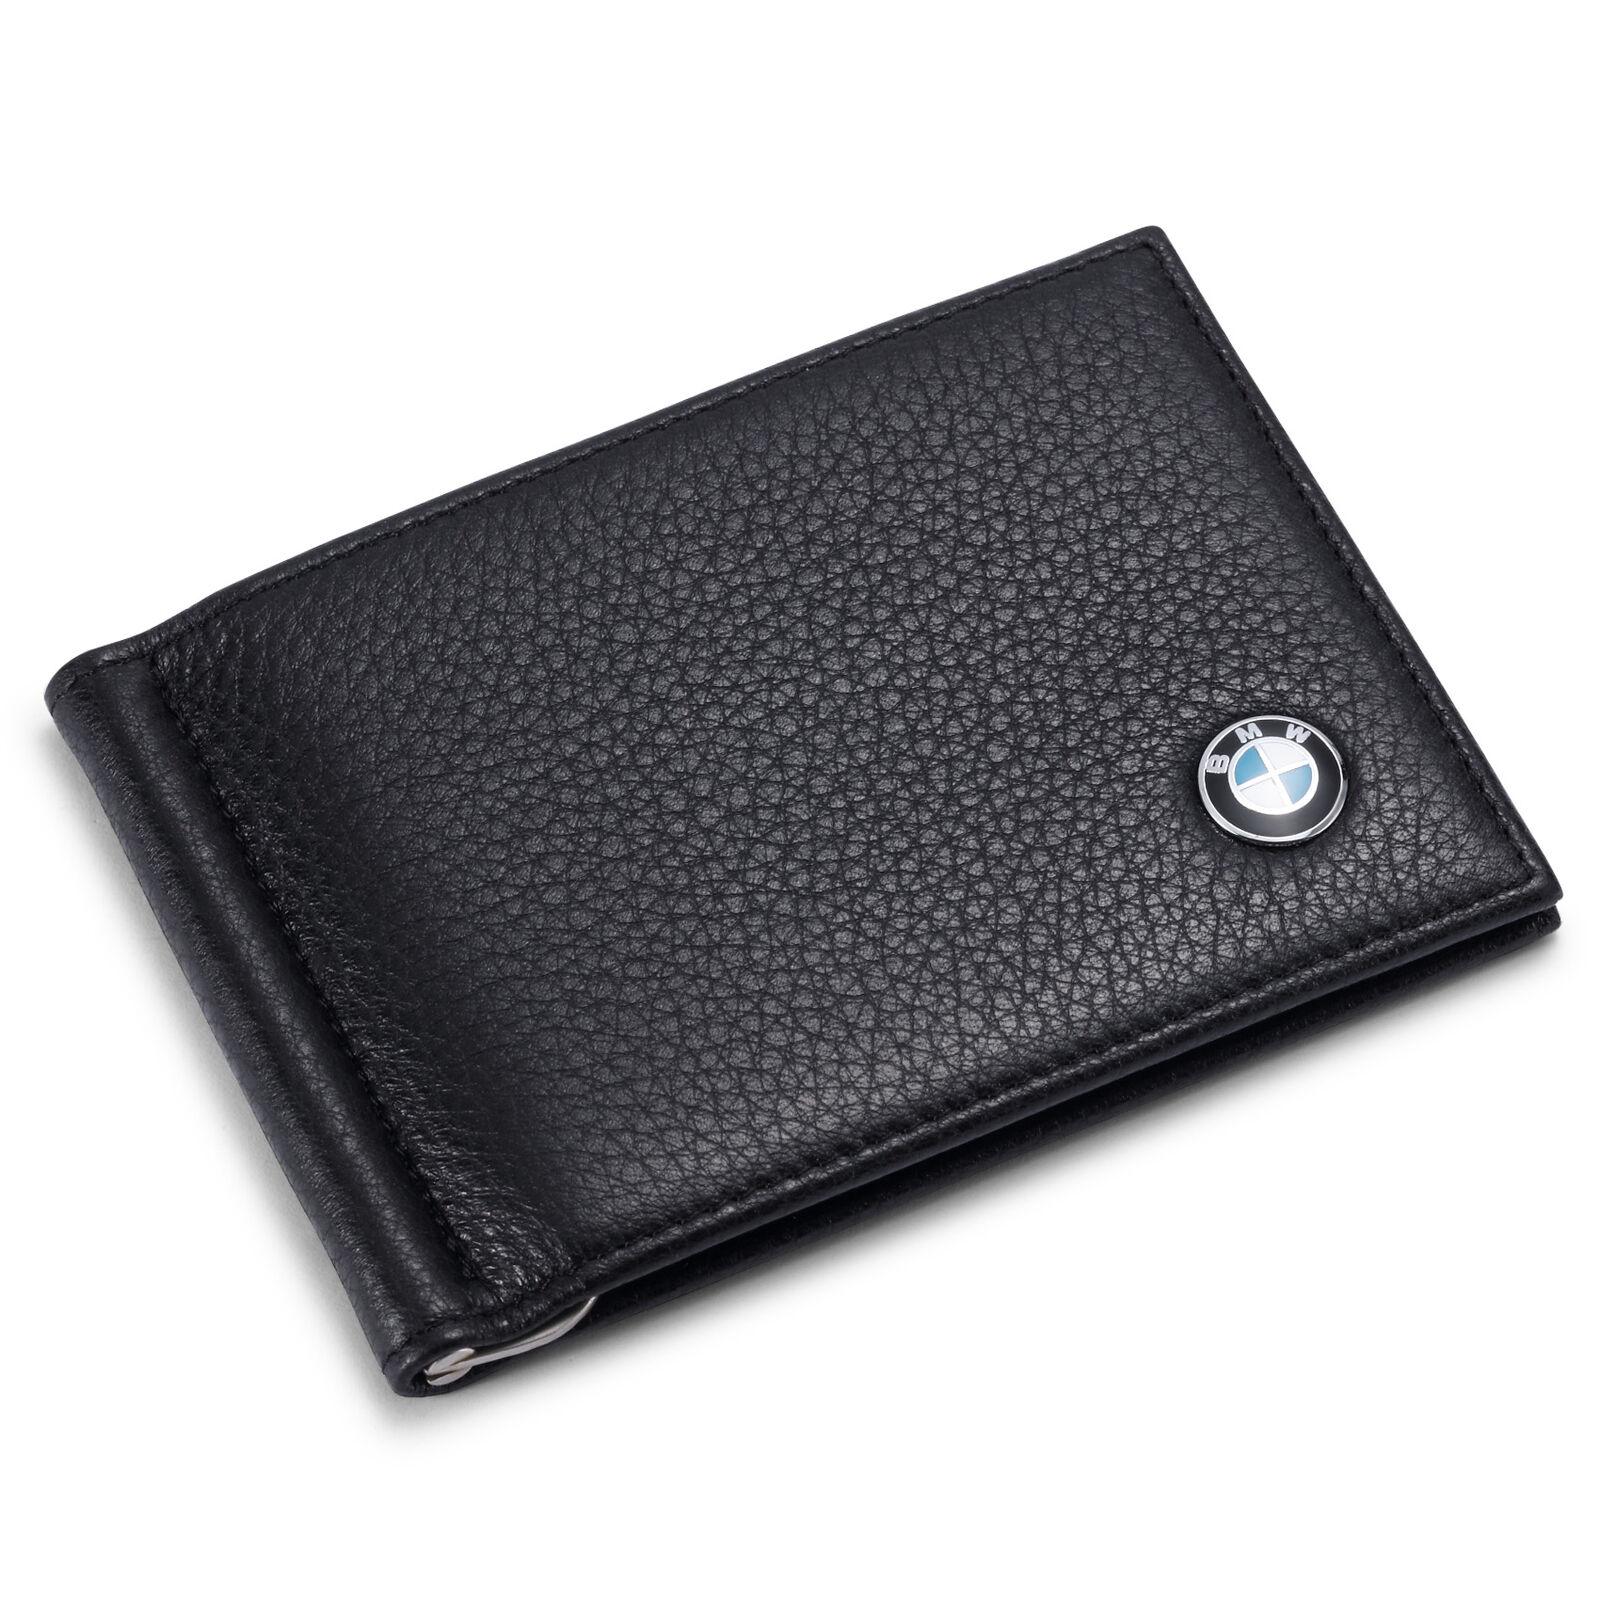 ecd5e056 new BMW Men Money Clip Wallet Black Genuine Leather 6 Credit Card Holder ID  Case